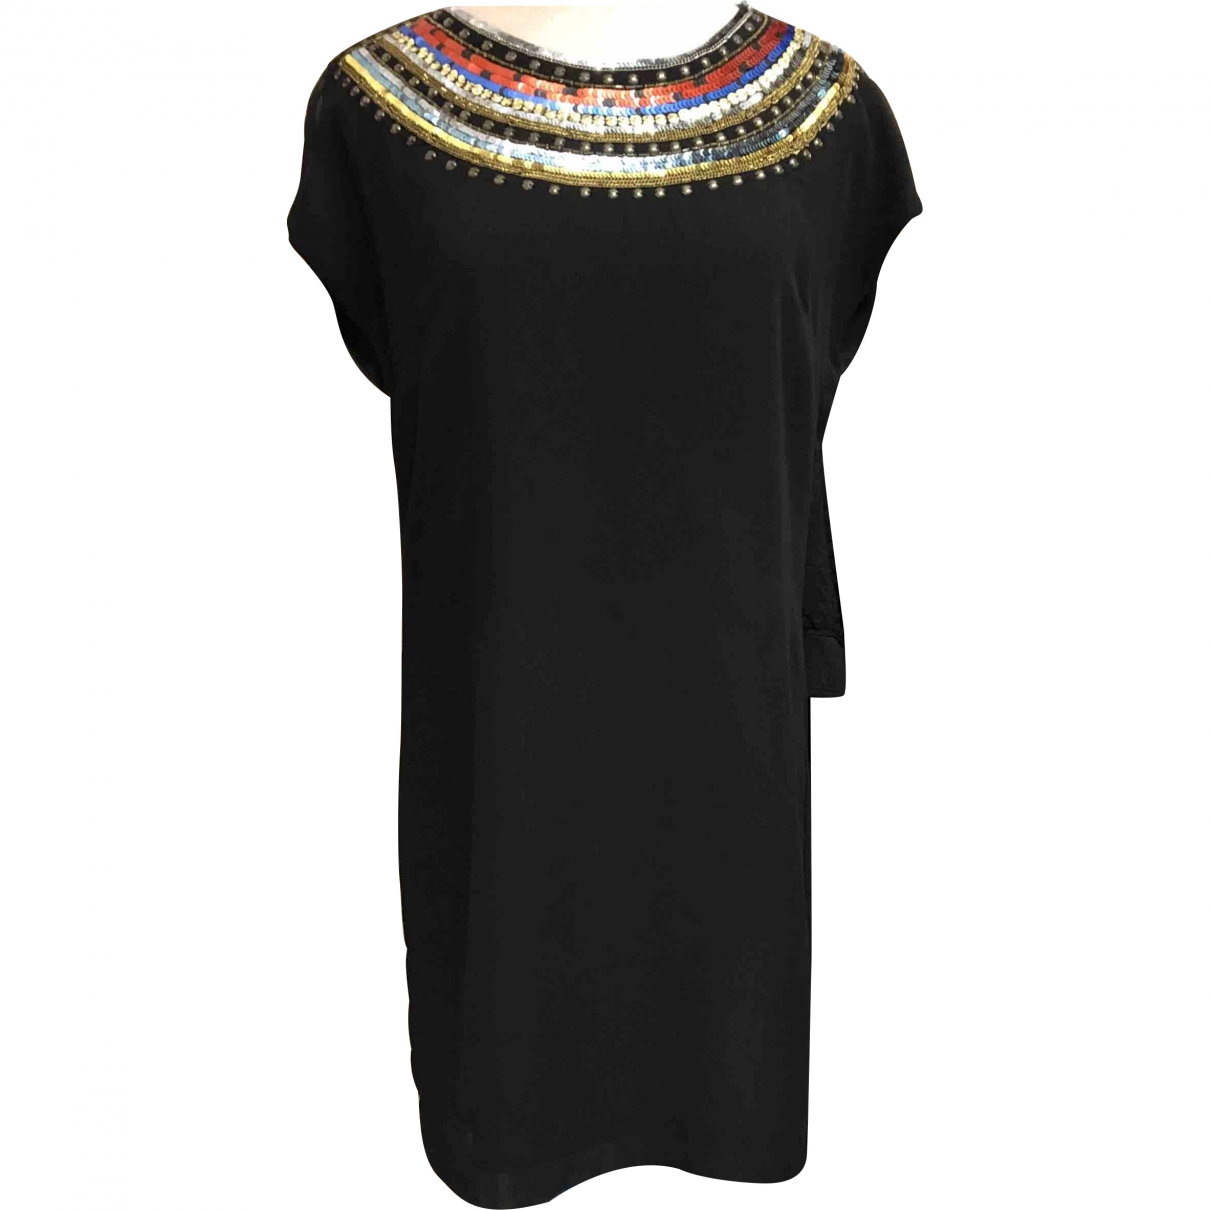 Matthew Williamson \N Black Glitter dress for Women 40 IT